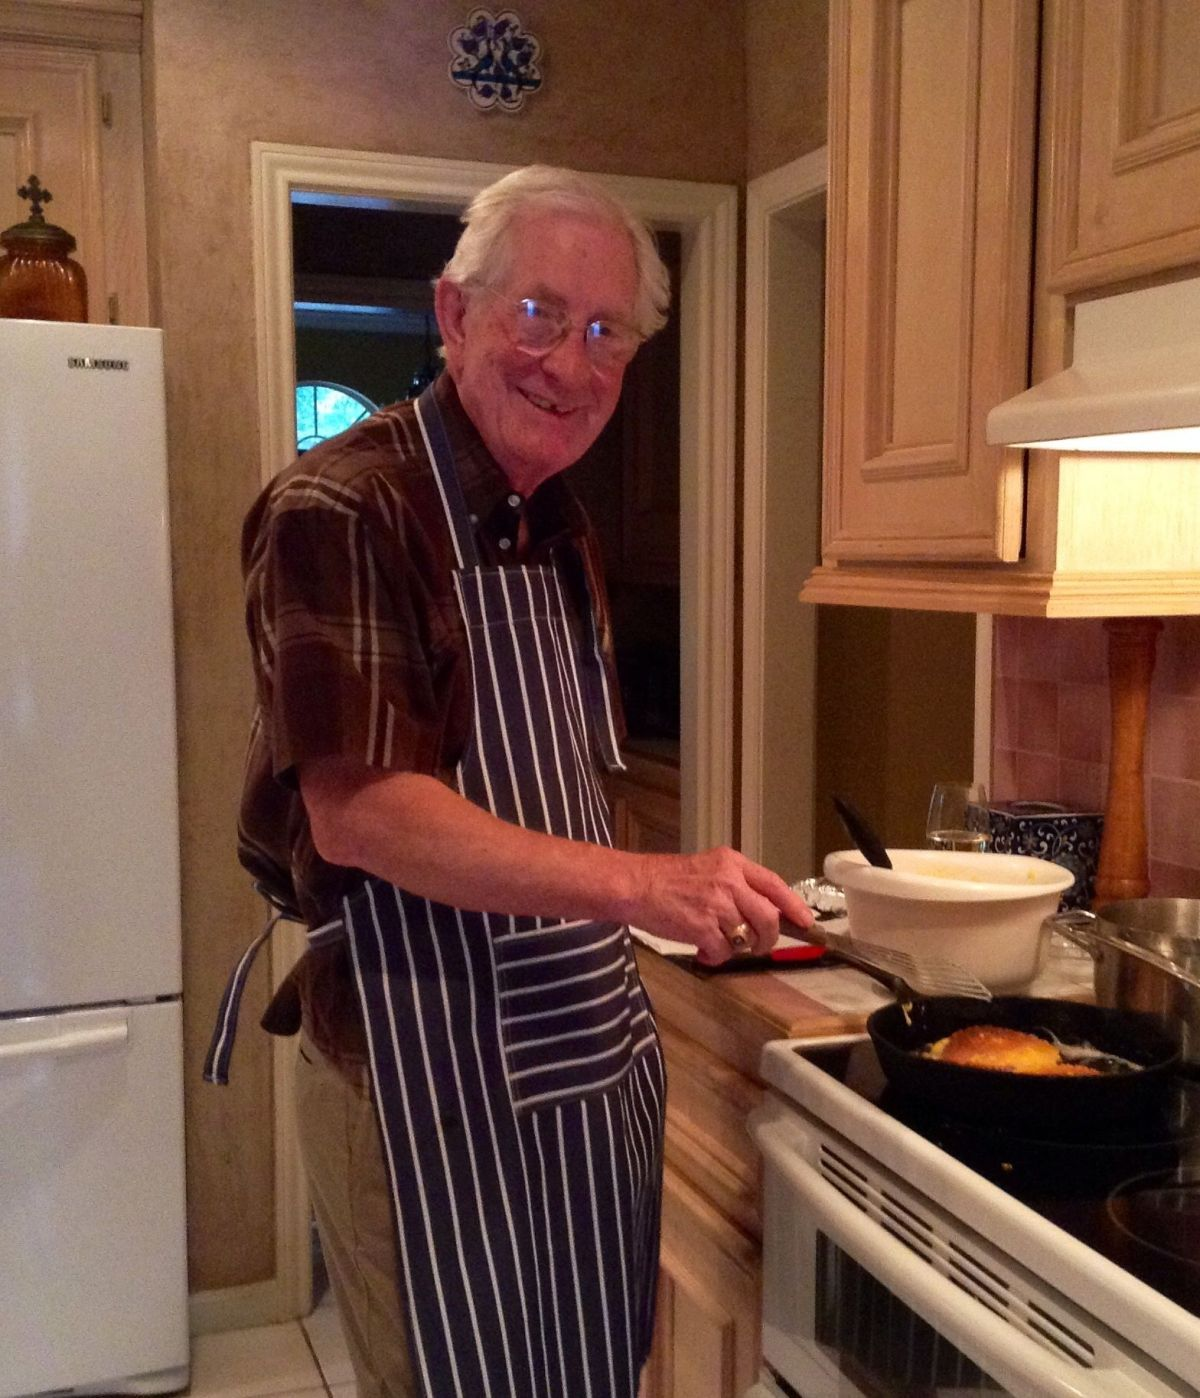 Dad at the Stove